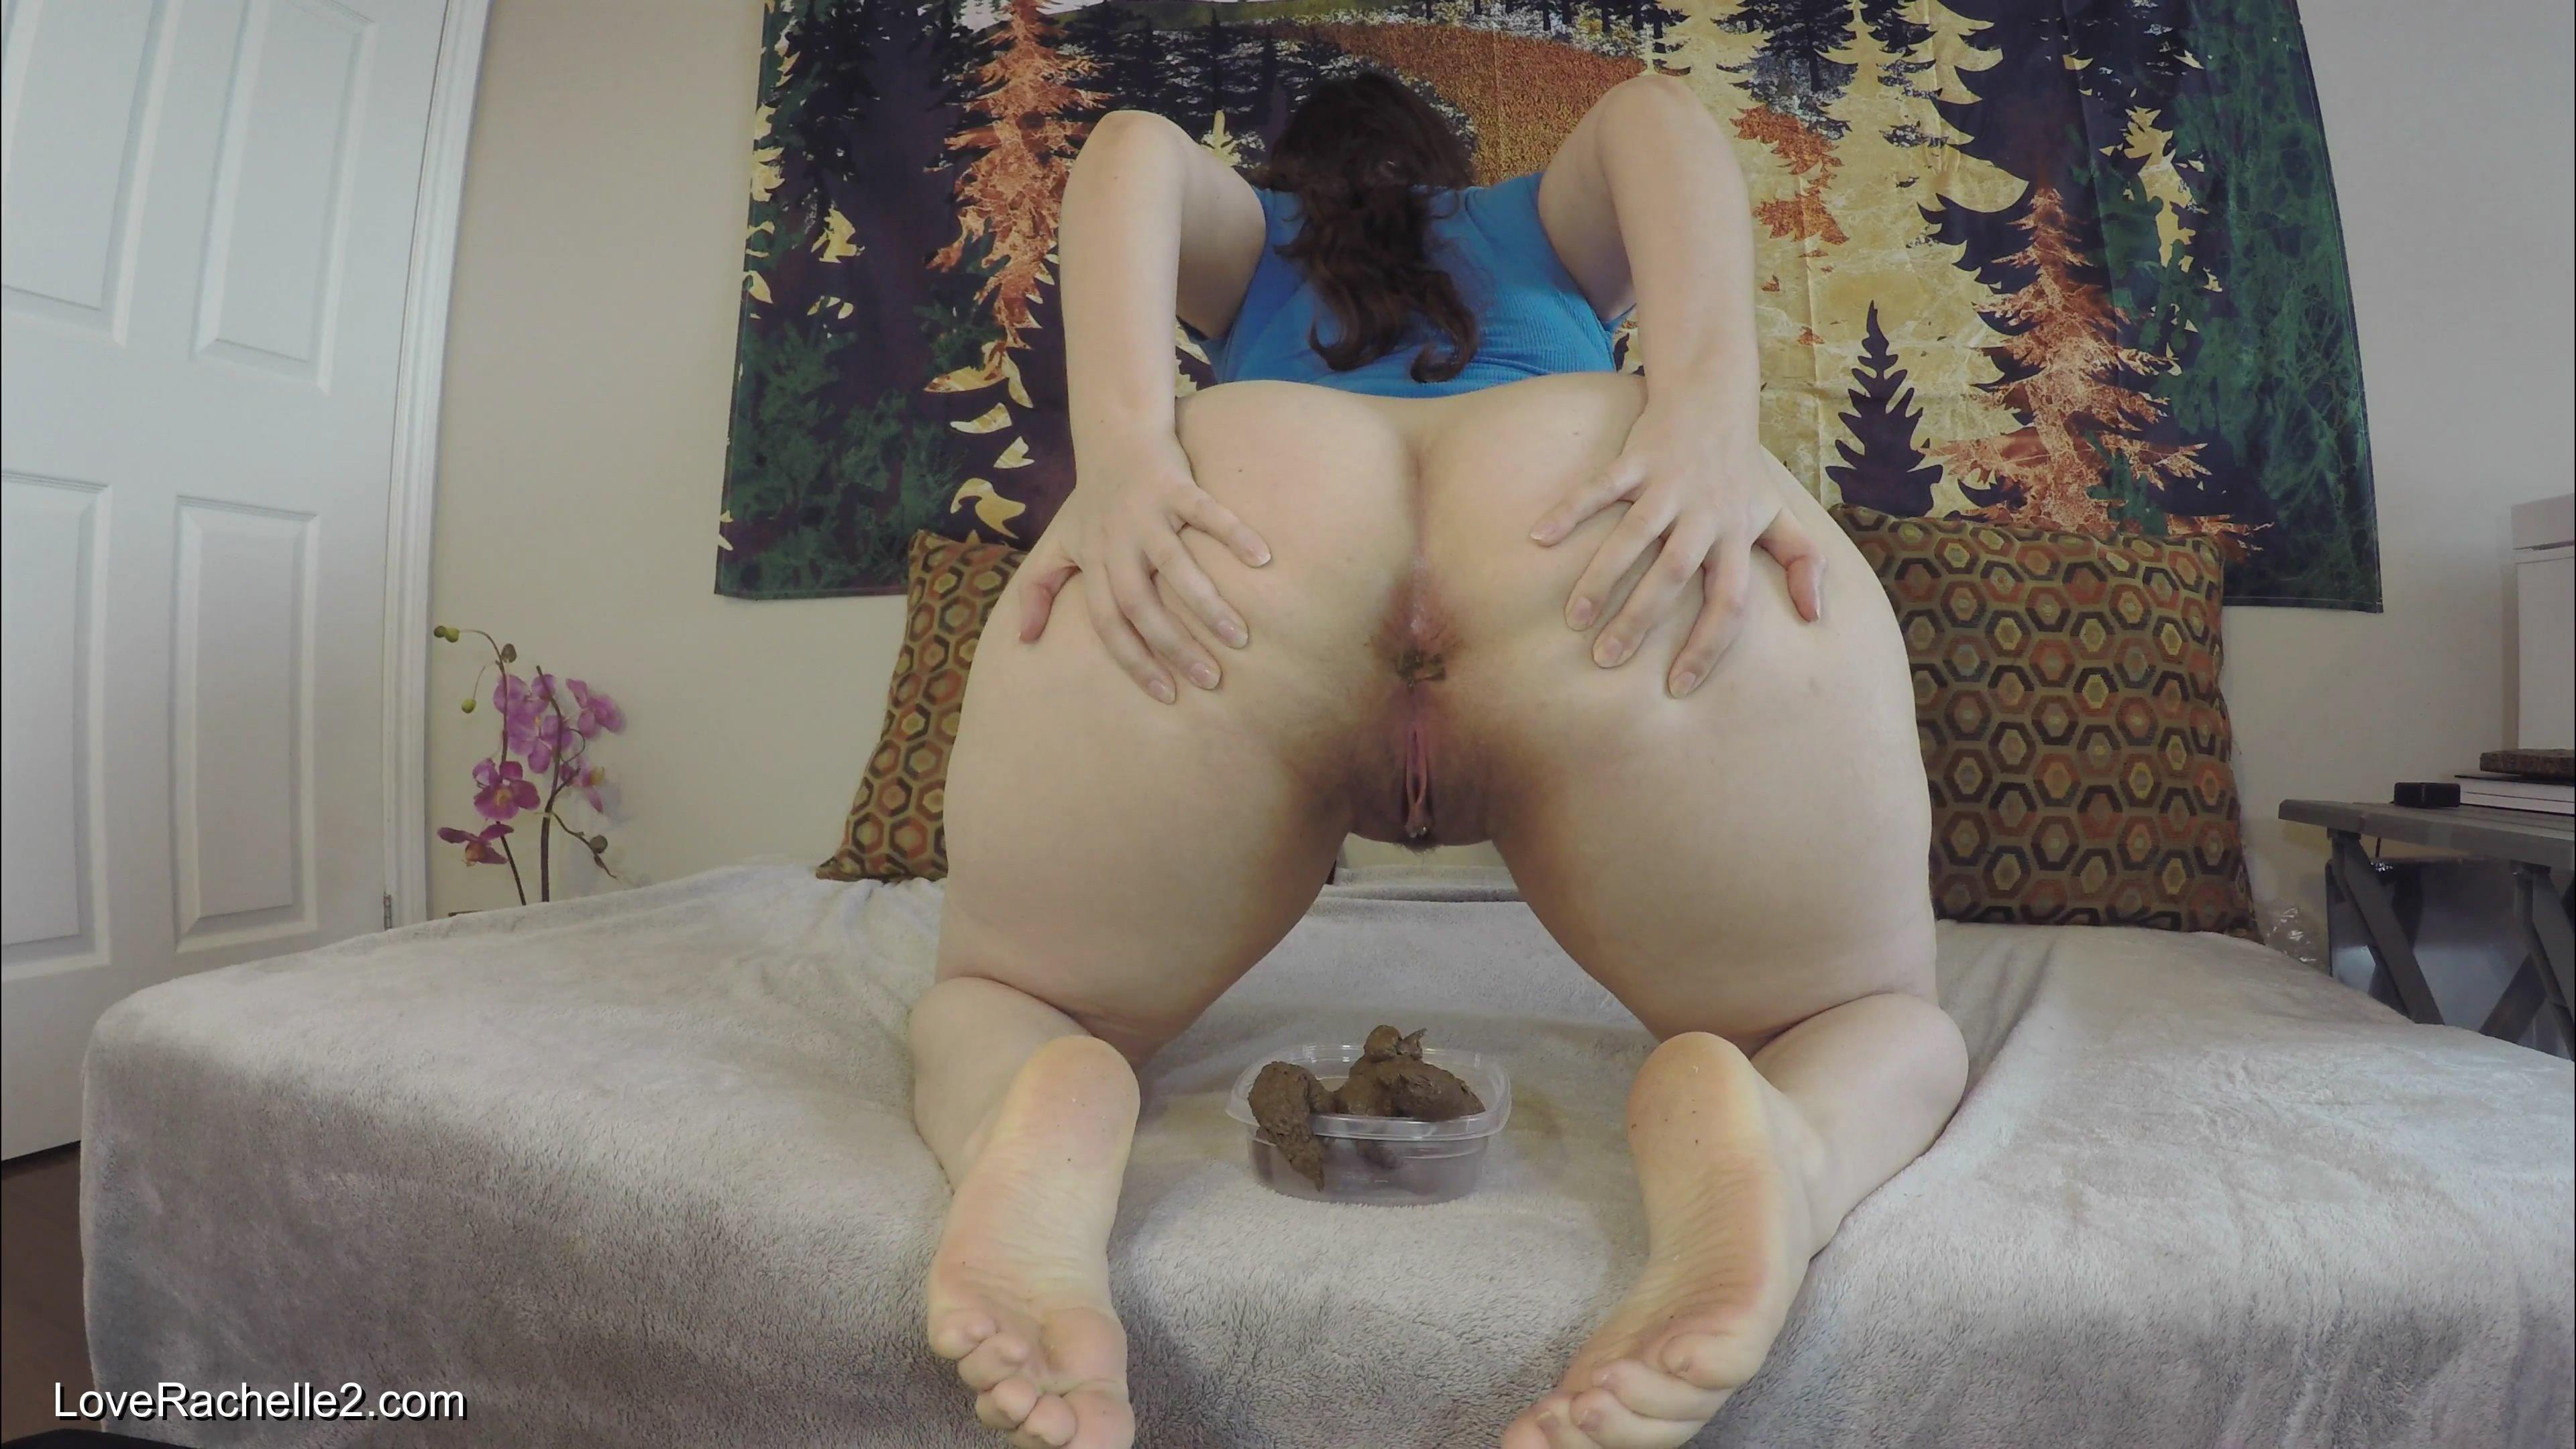 In Your Stomach, Pig (4K) starring in video LoveRachelle2 ($13.99 ScatShop)